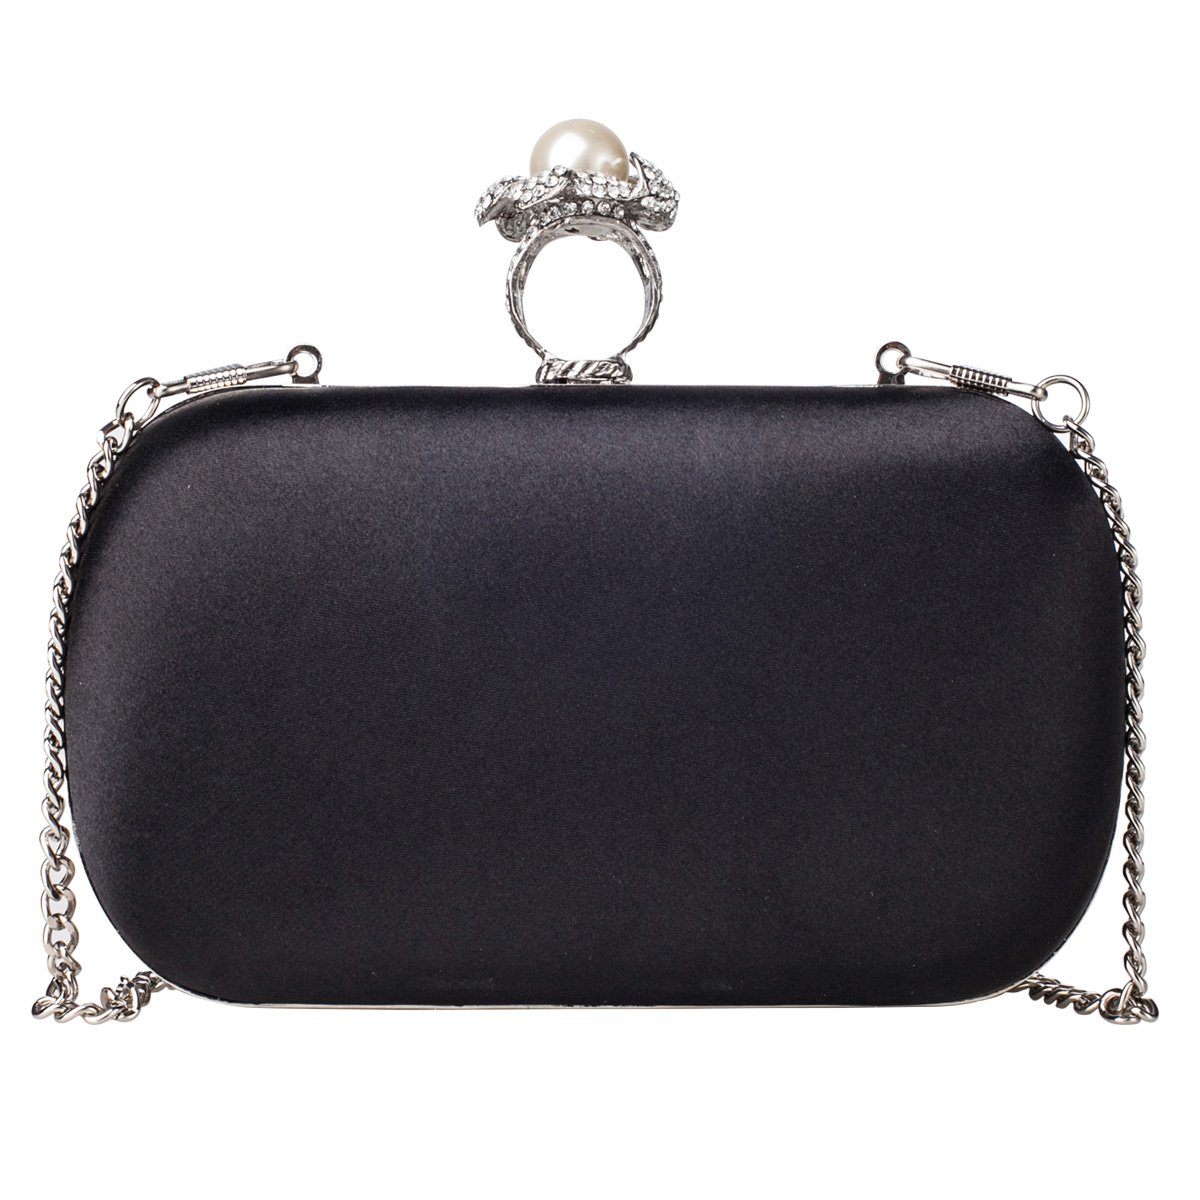 Big Hot Sale Clean Stock Low Price La Cle LA-044 Evening Clutch Bag Purse( Black): Amazon.co.uk: Luggage